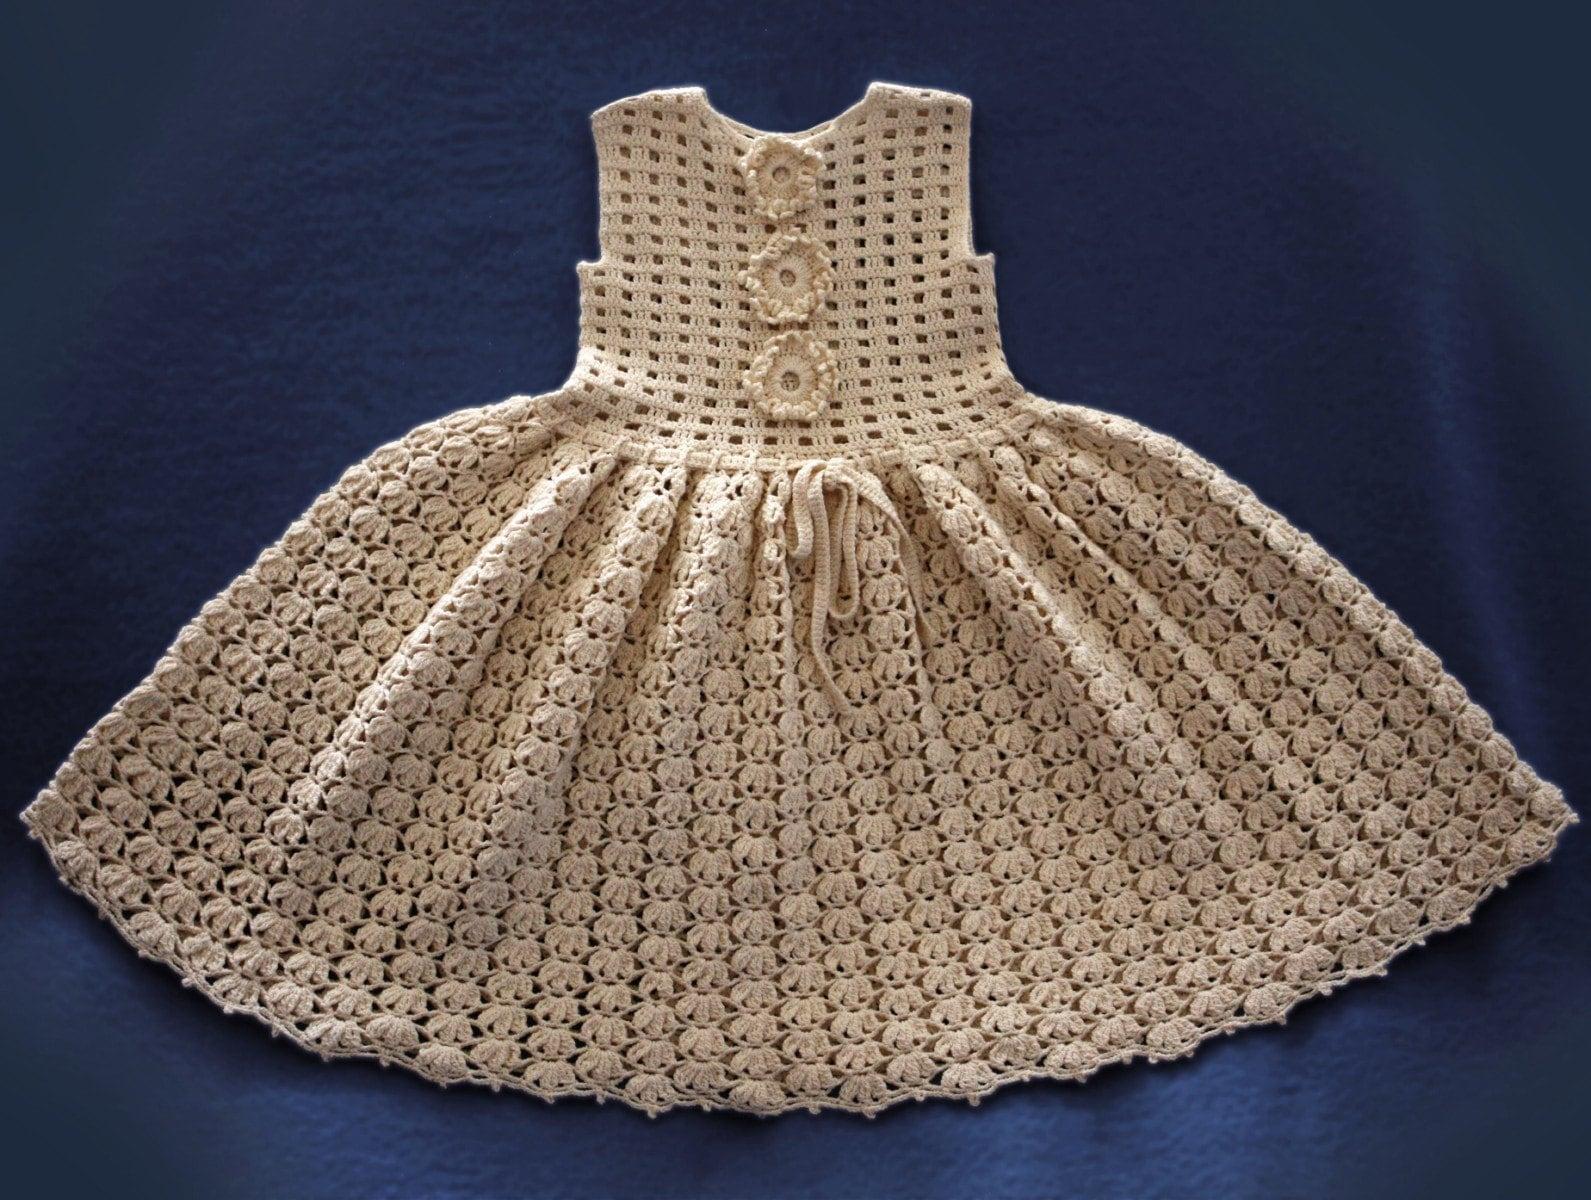 Crochet Baby Outfit Patterns : Baby Dress Crochet Pattern / Vintage by Illiana on Etsy